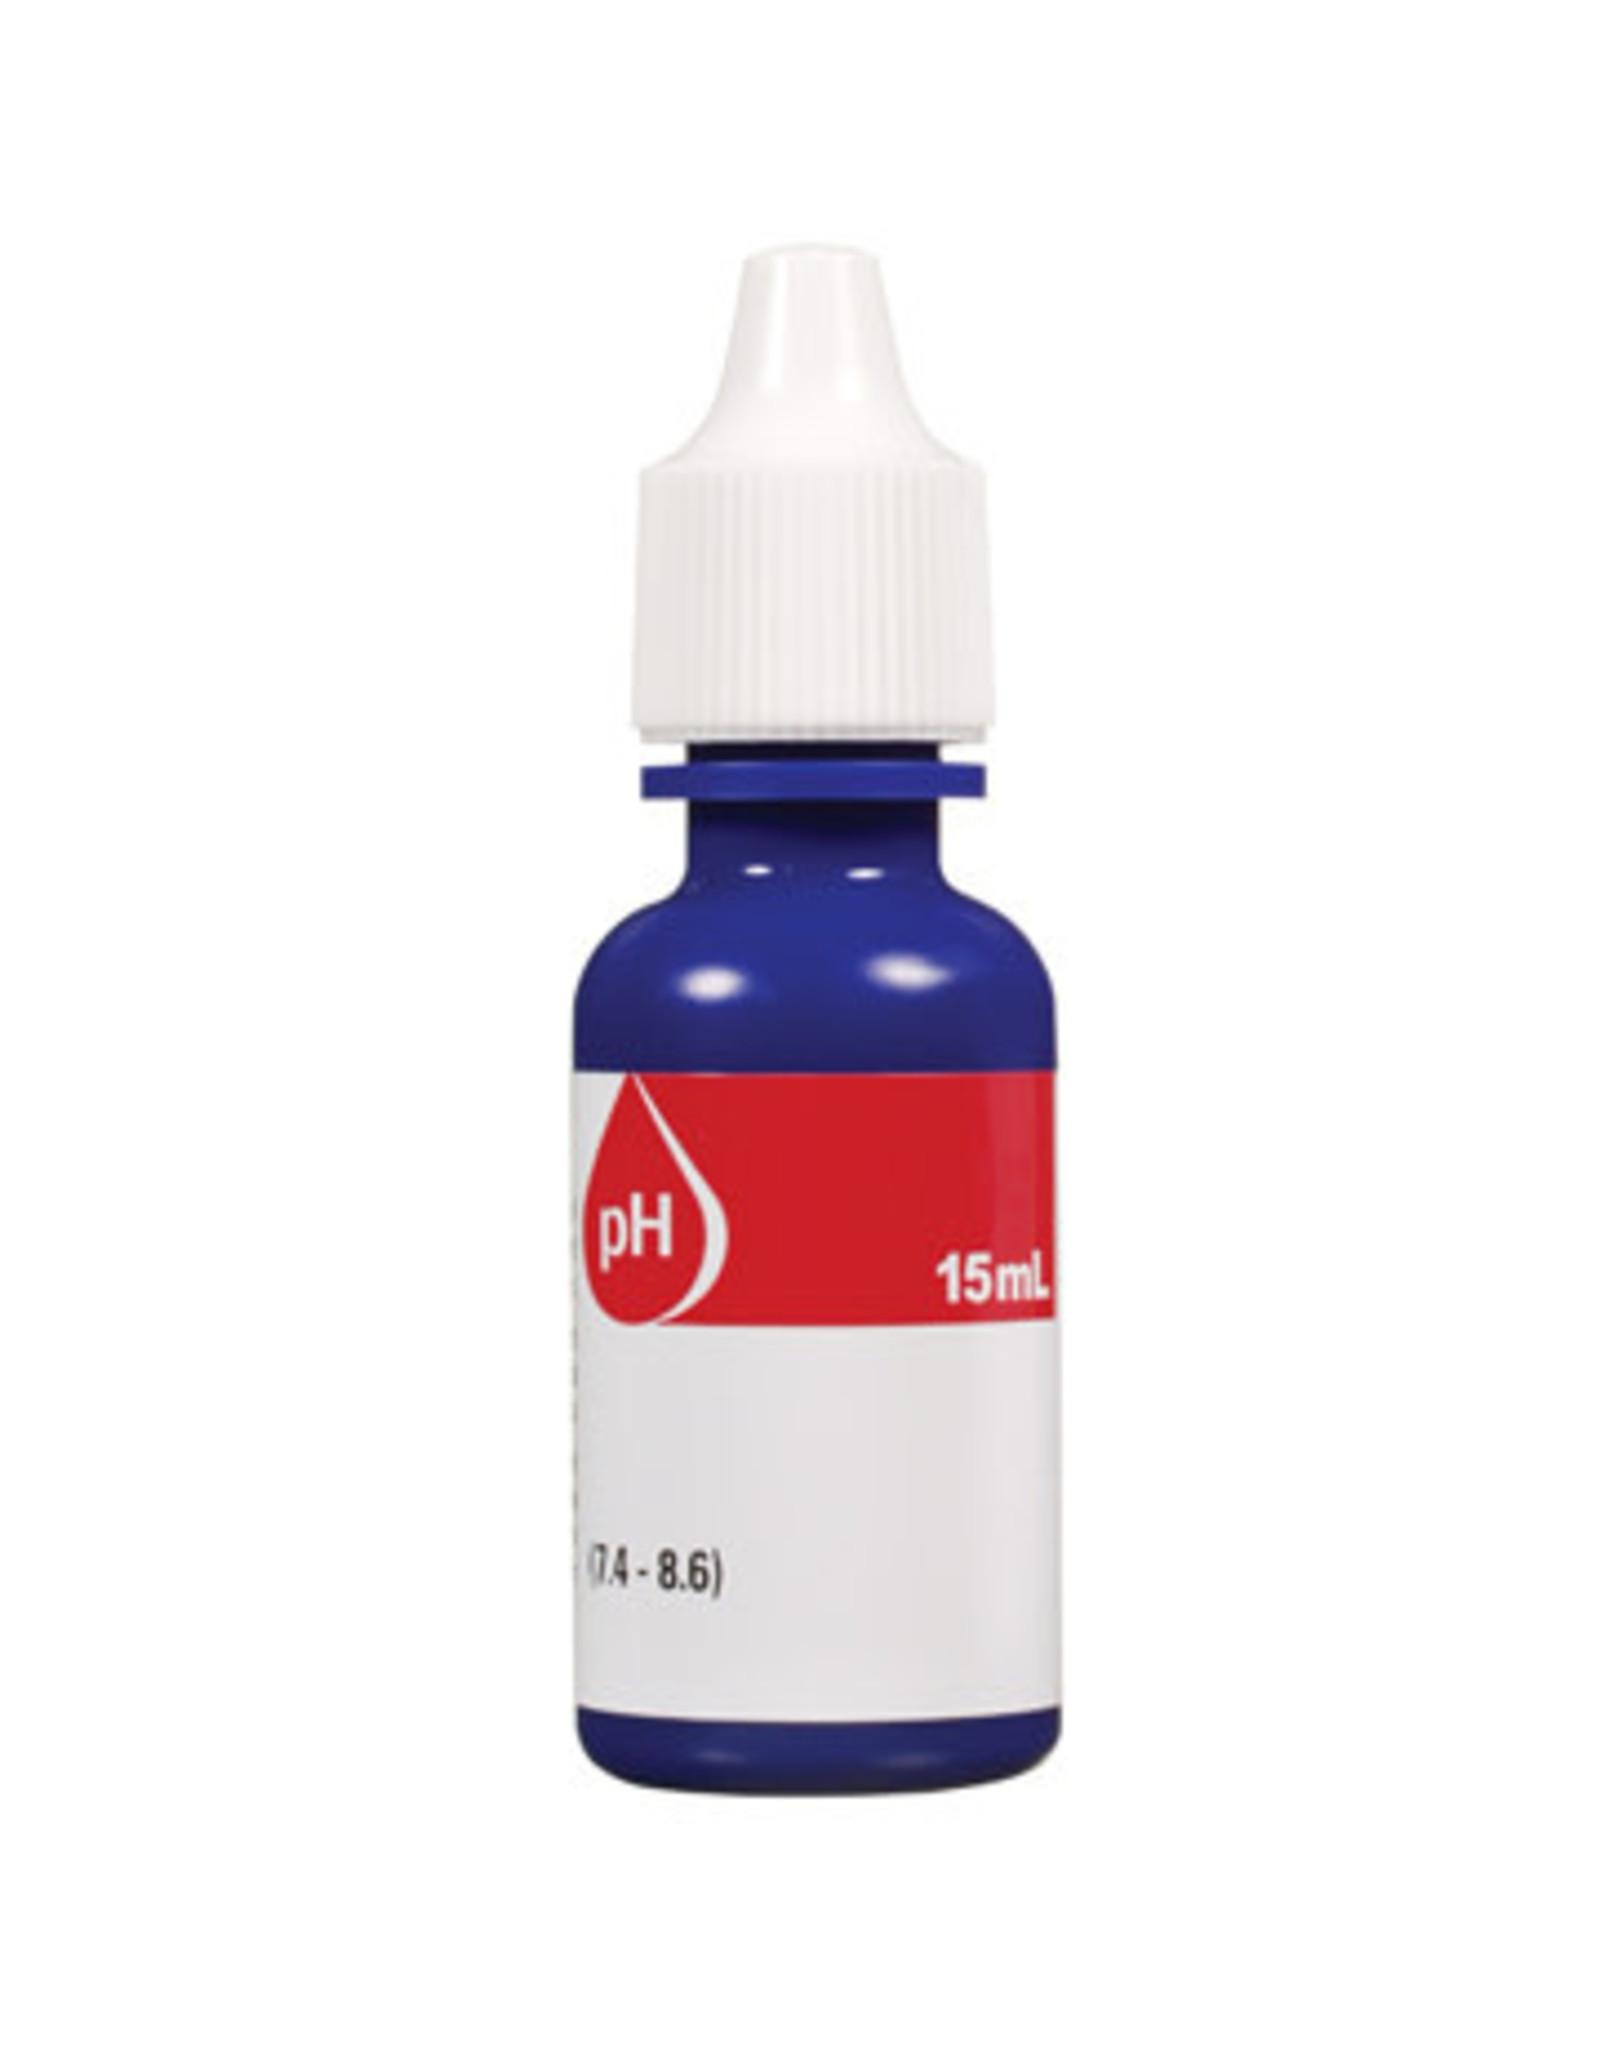 Nutrafin Nutrafin pH High Range reagent refill, 15 mL (0.5 fl oz)